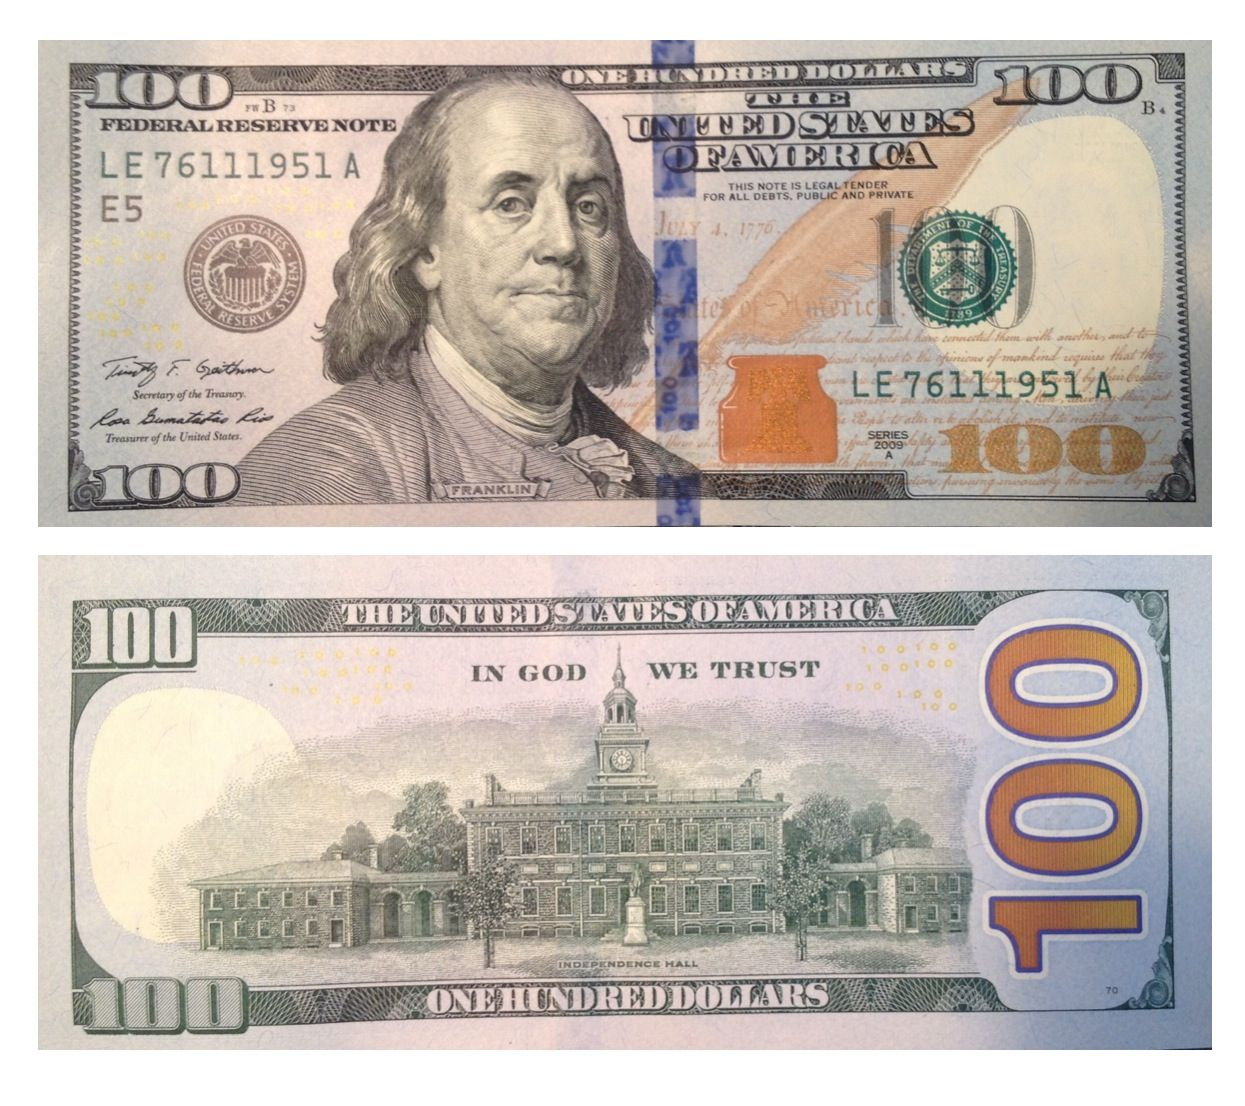 New 100 Dollar Bill Fake Proof